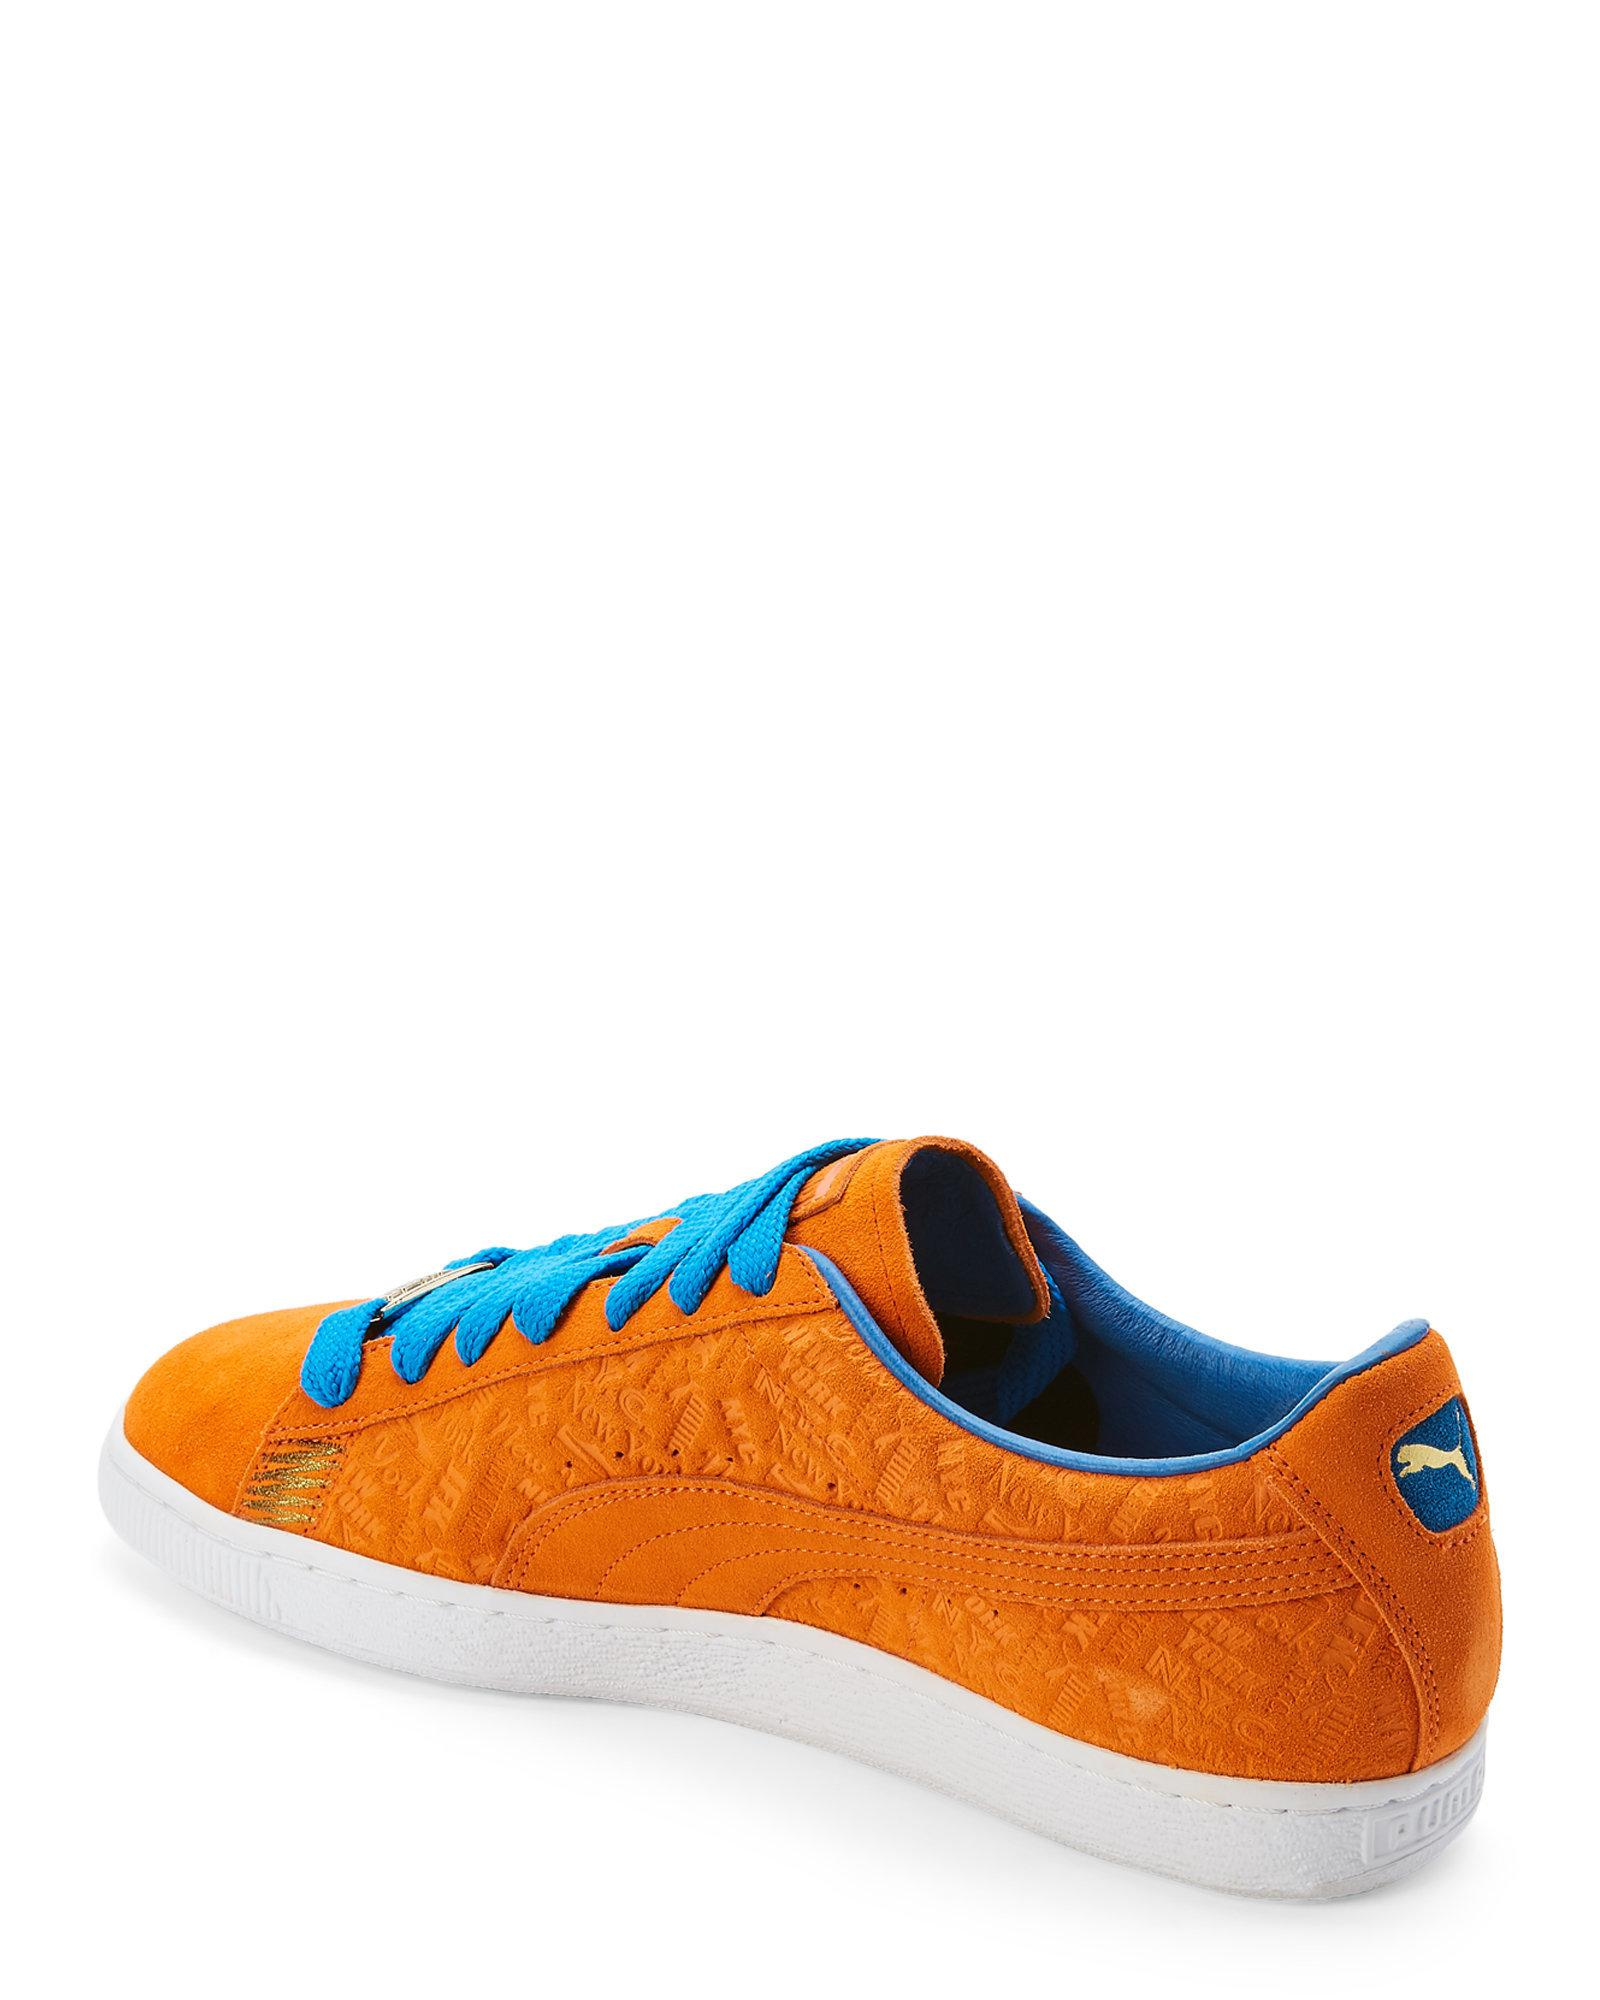 PUMA Orange & Blue Suede Classic New York Knicks Sneakers